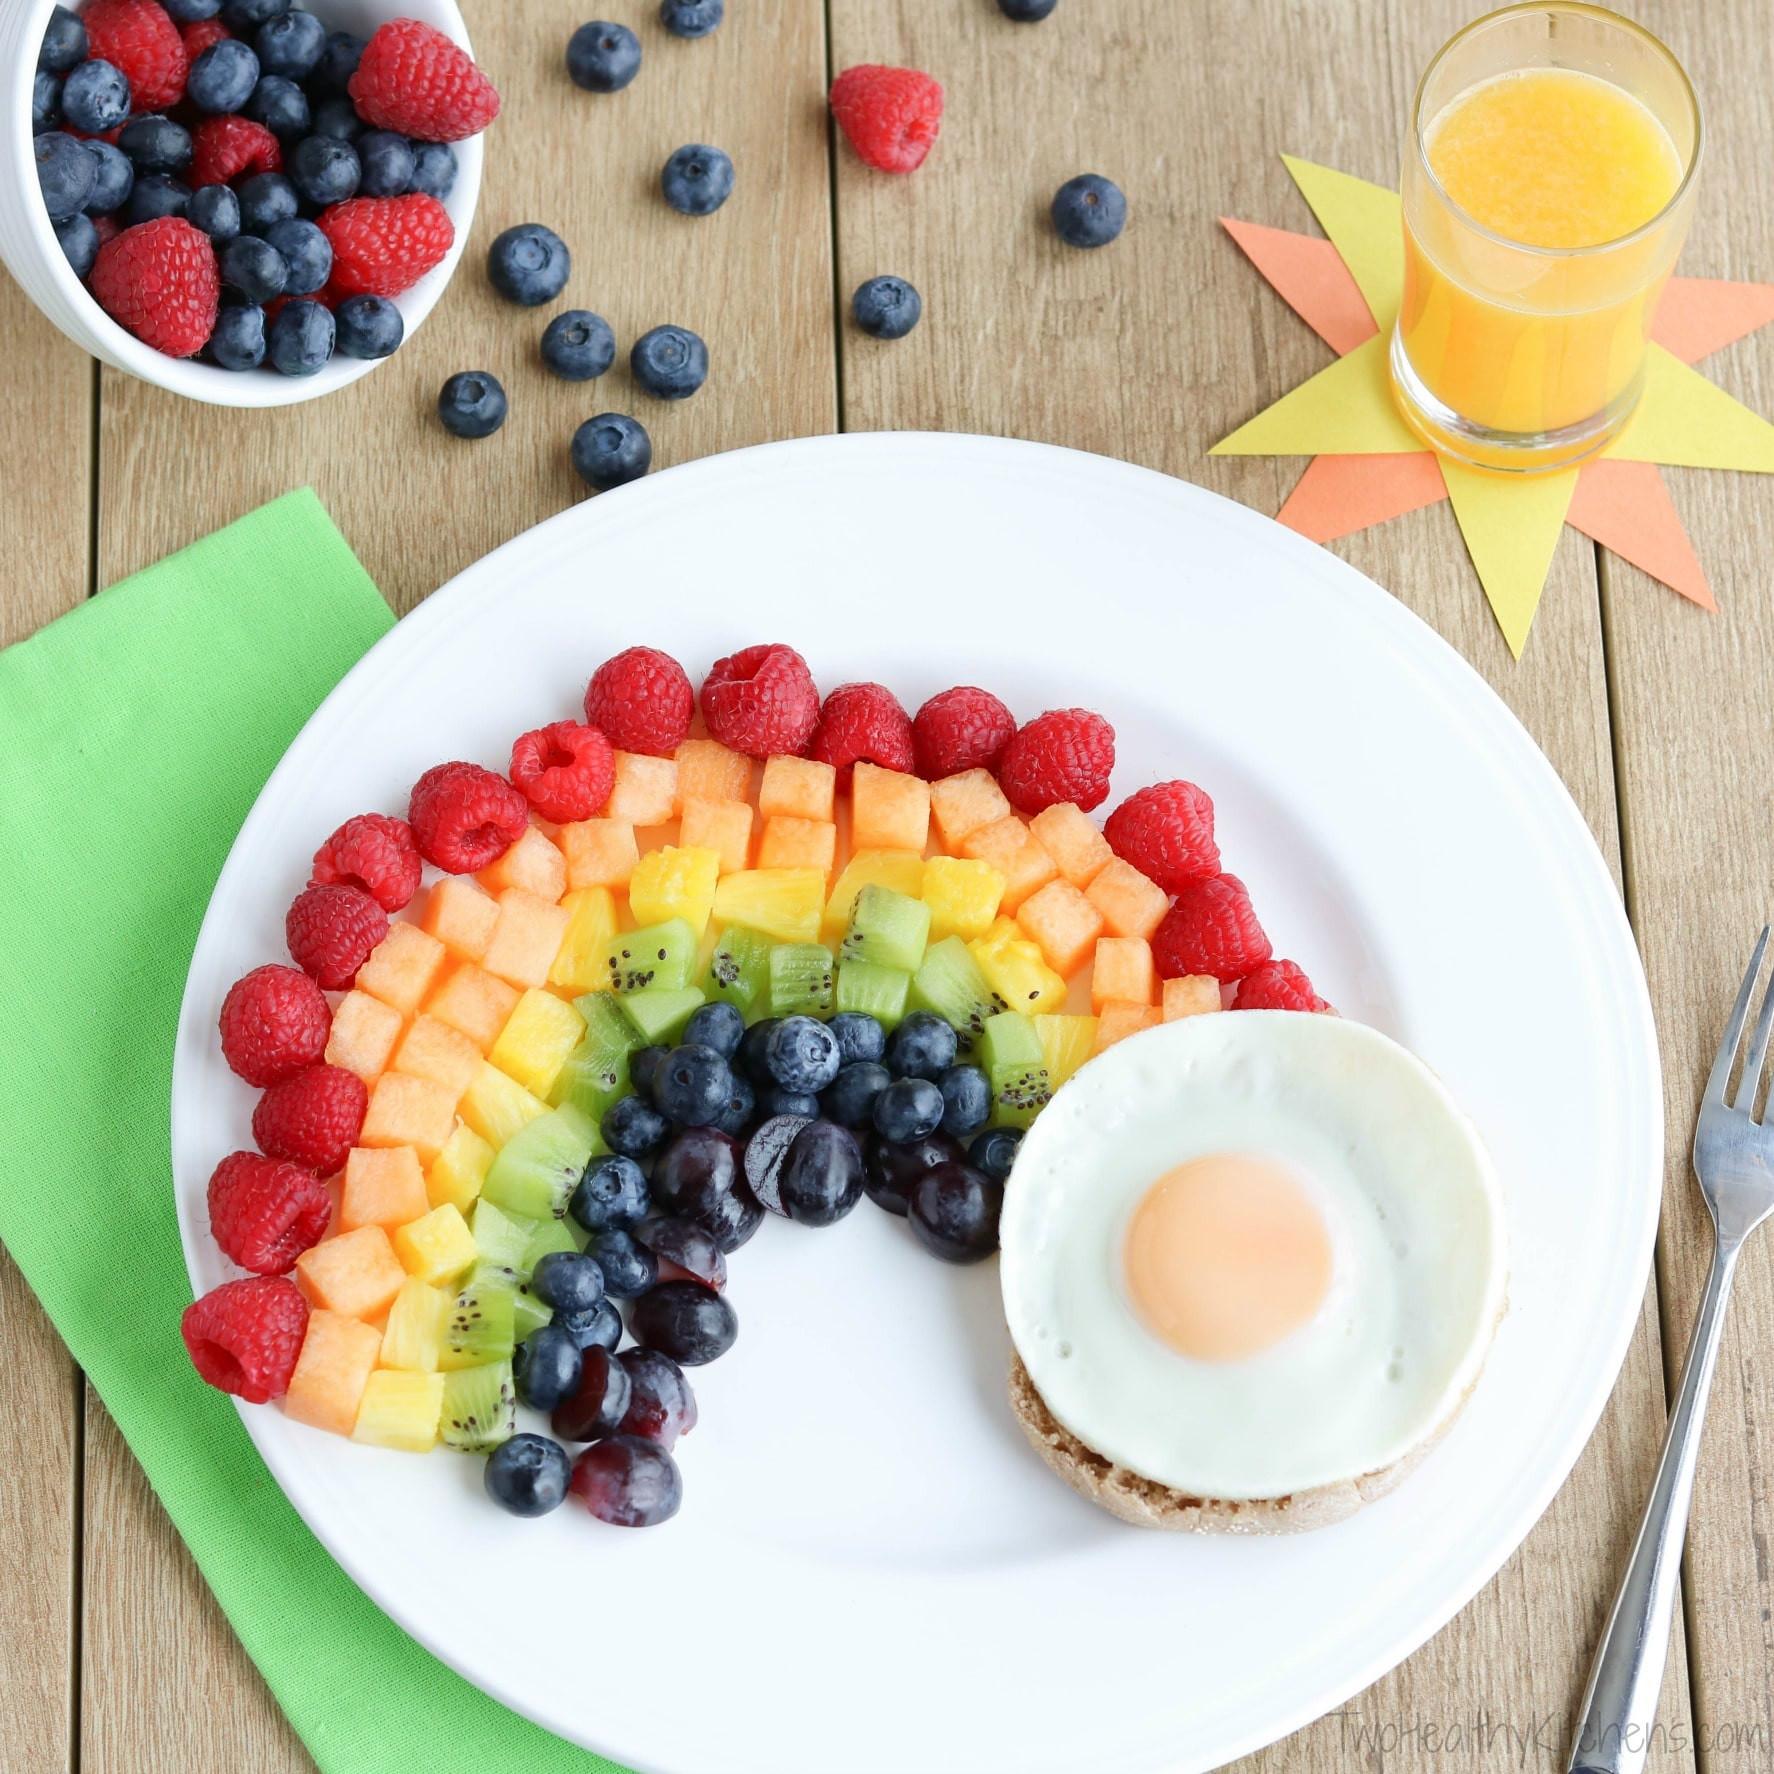 Healthy Breakfast Kids  Fruit Rainbow with a Pot of Gold Fun Breakfast Idea for